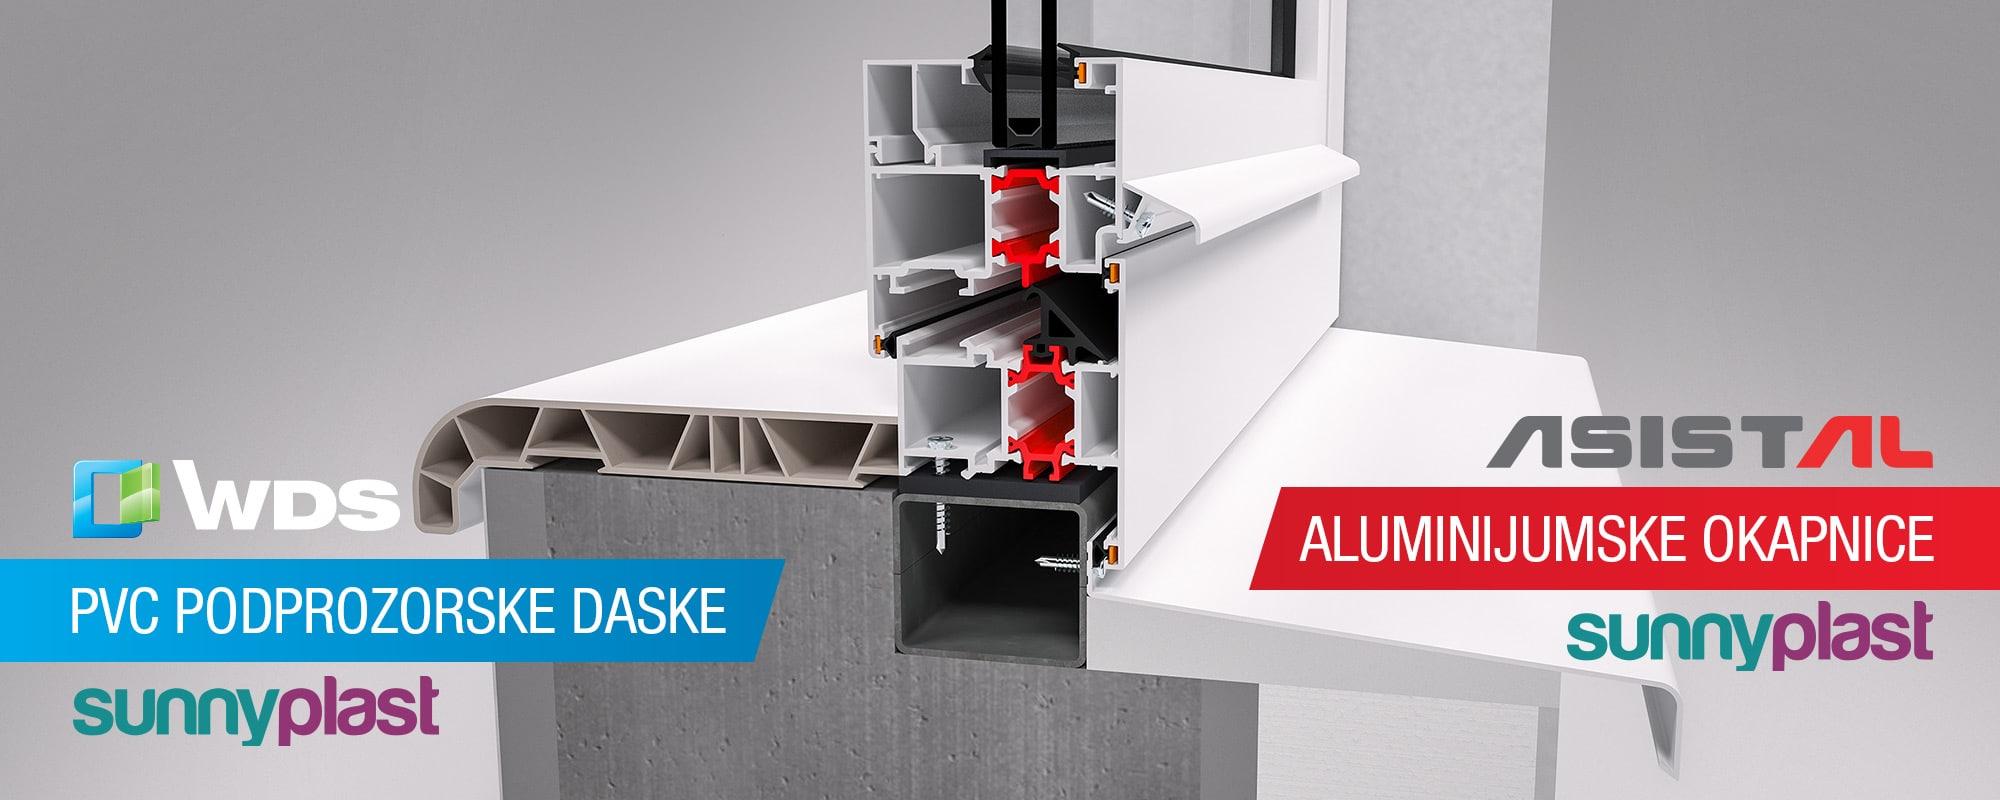 PVC podprozorske daske i aluminijumske okapnice